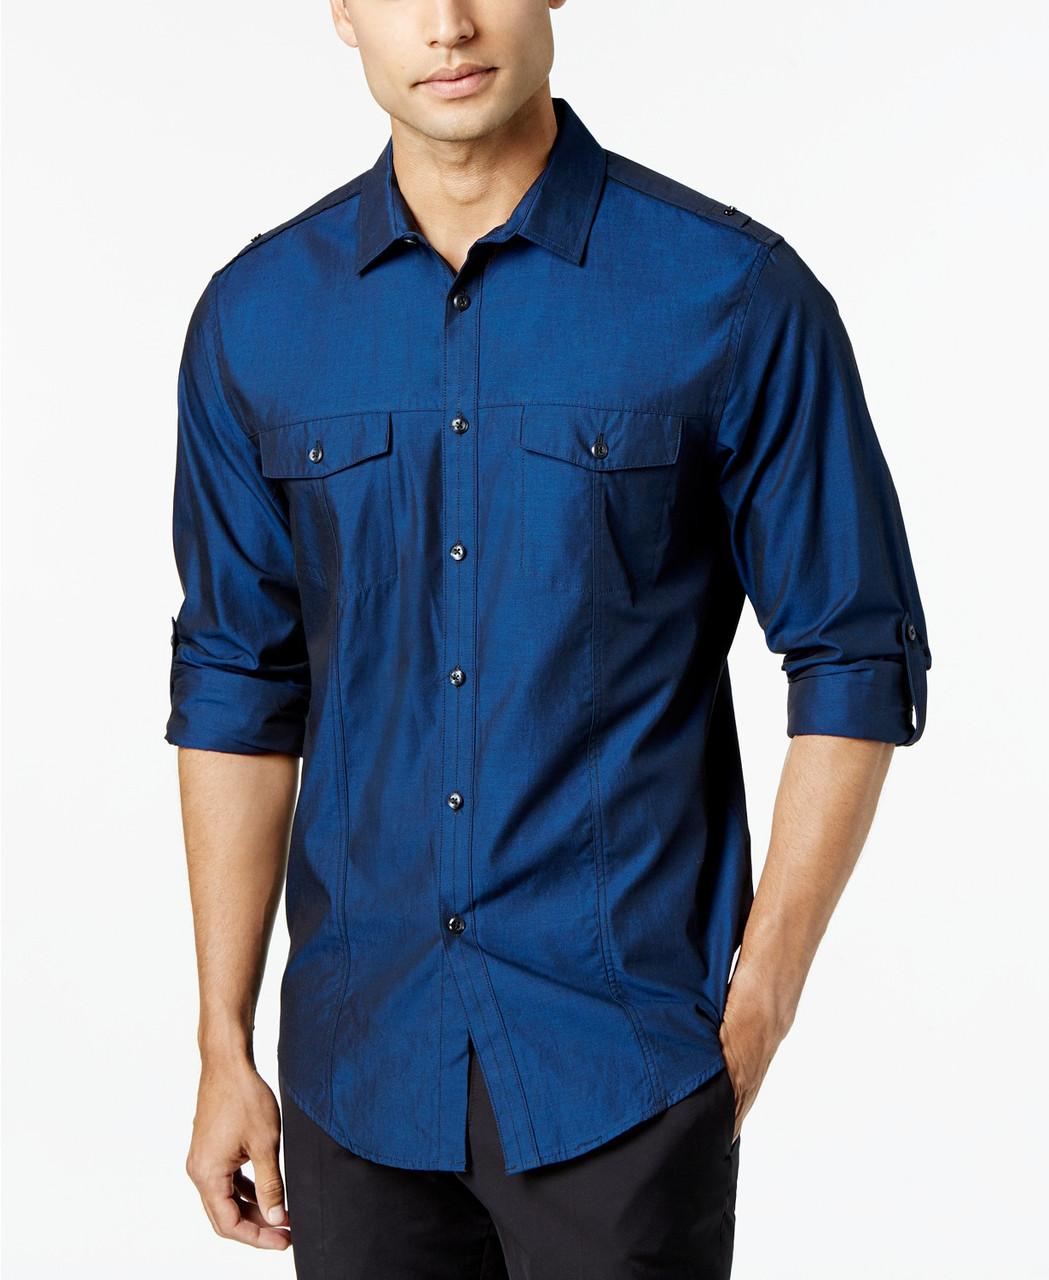 Inc International Concepts Мужская рубашка - Е2